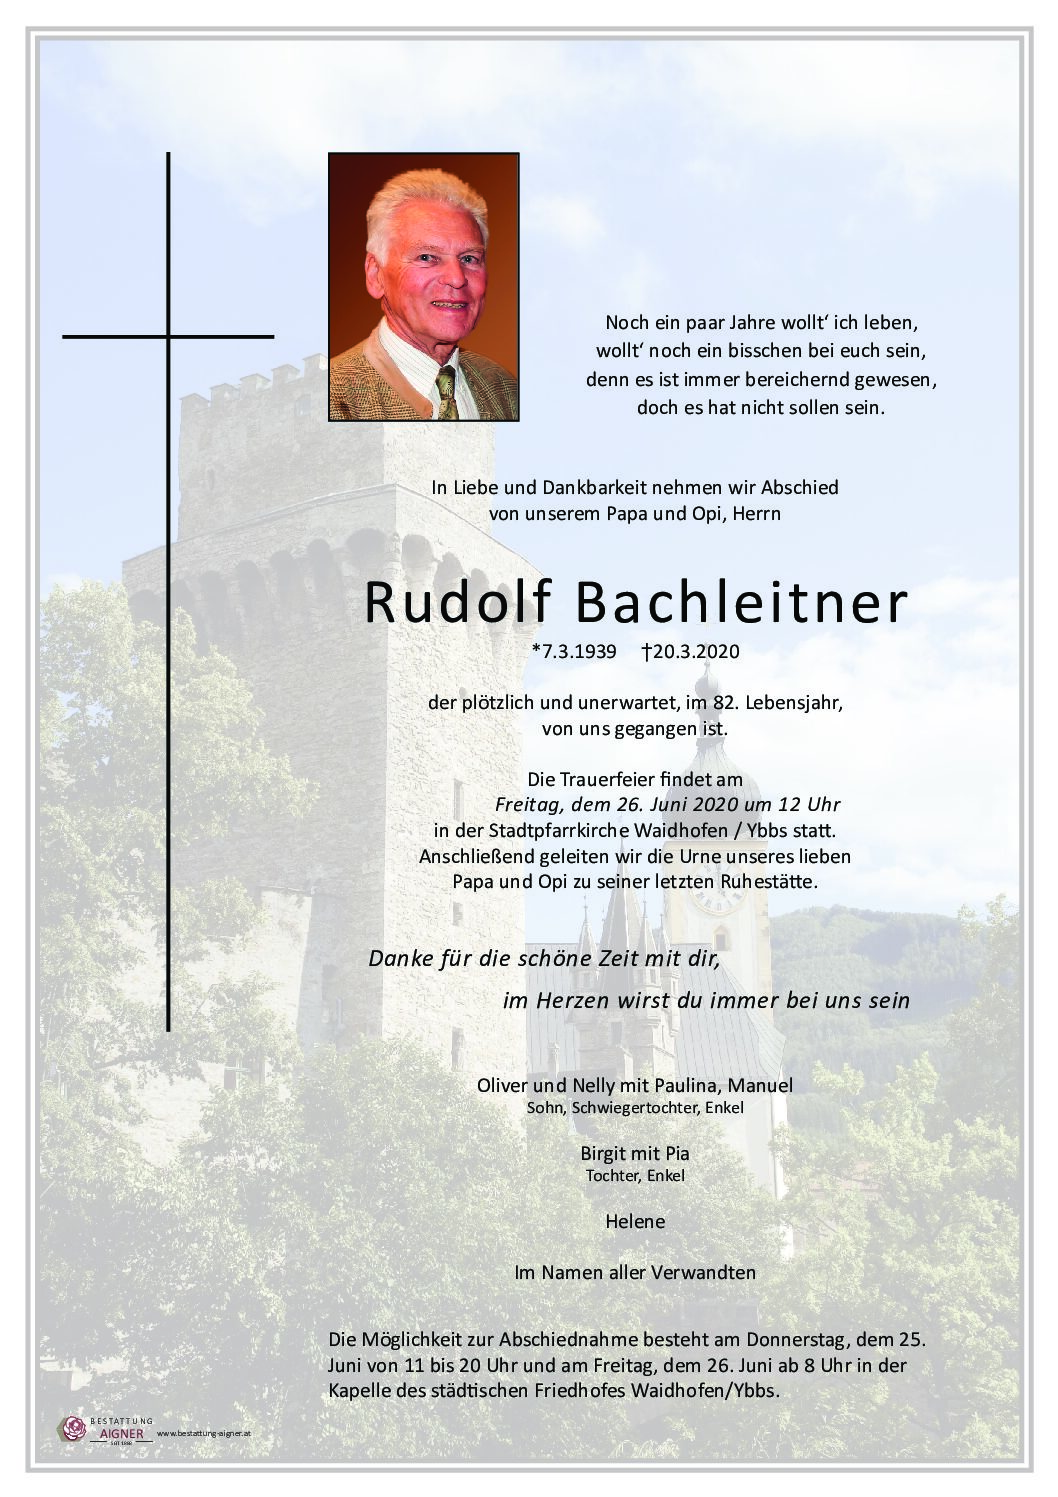 Rudolf Bachleitner